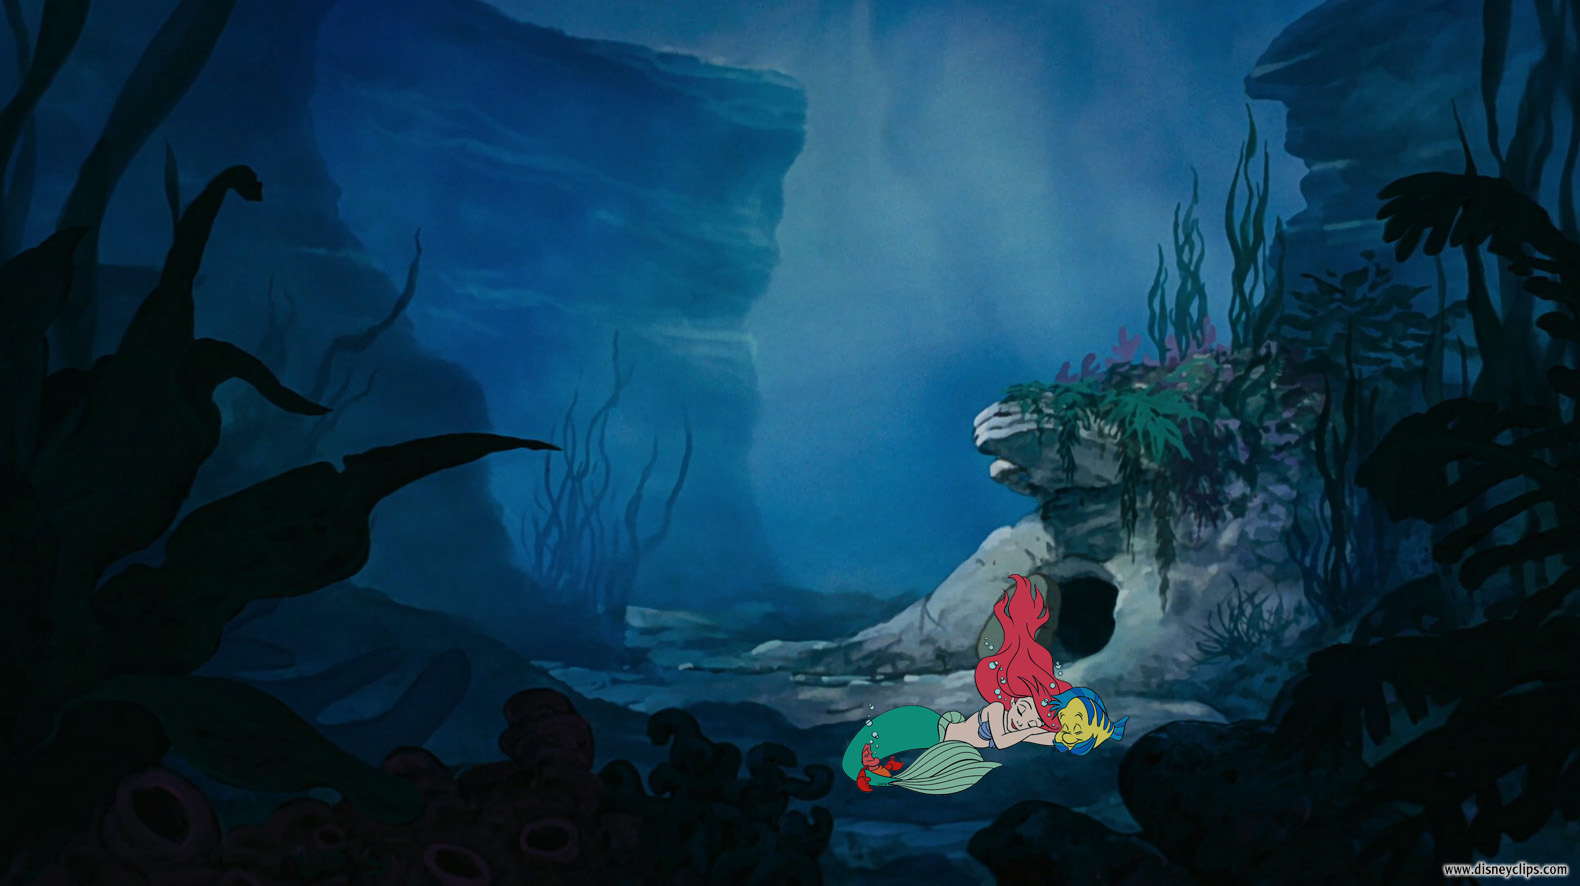 The Little Mermaid Wallpaper Disneyclips Com